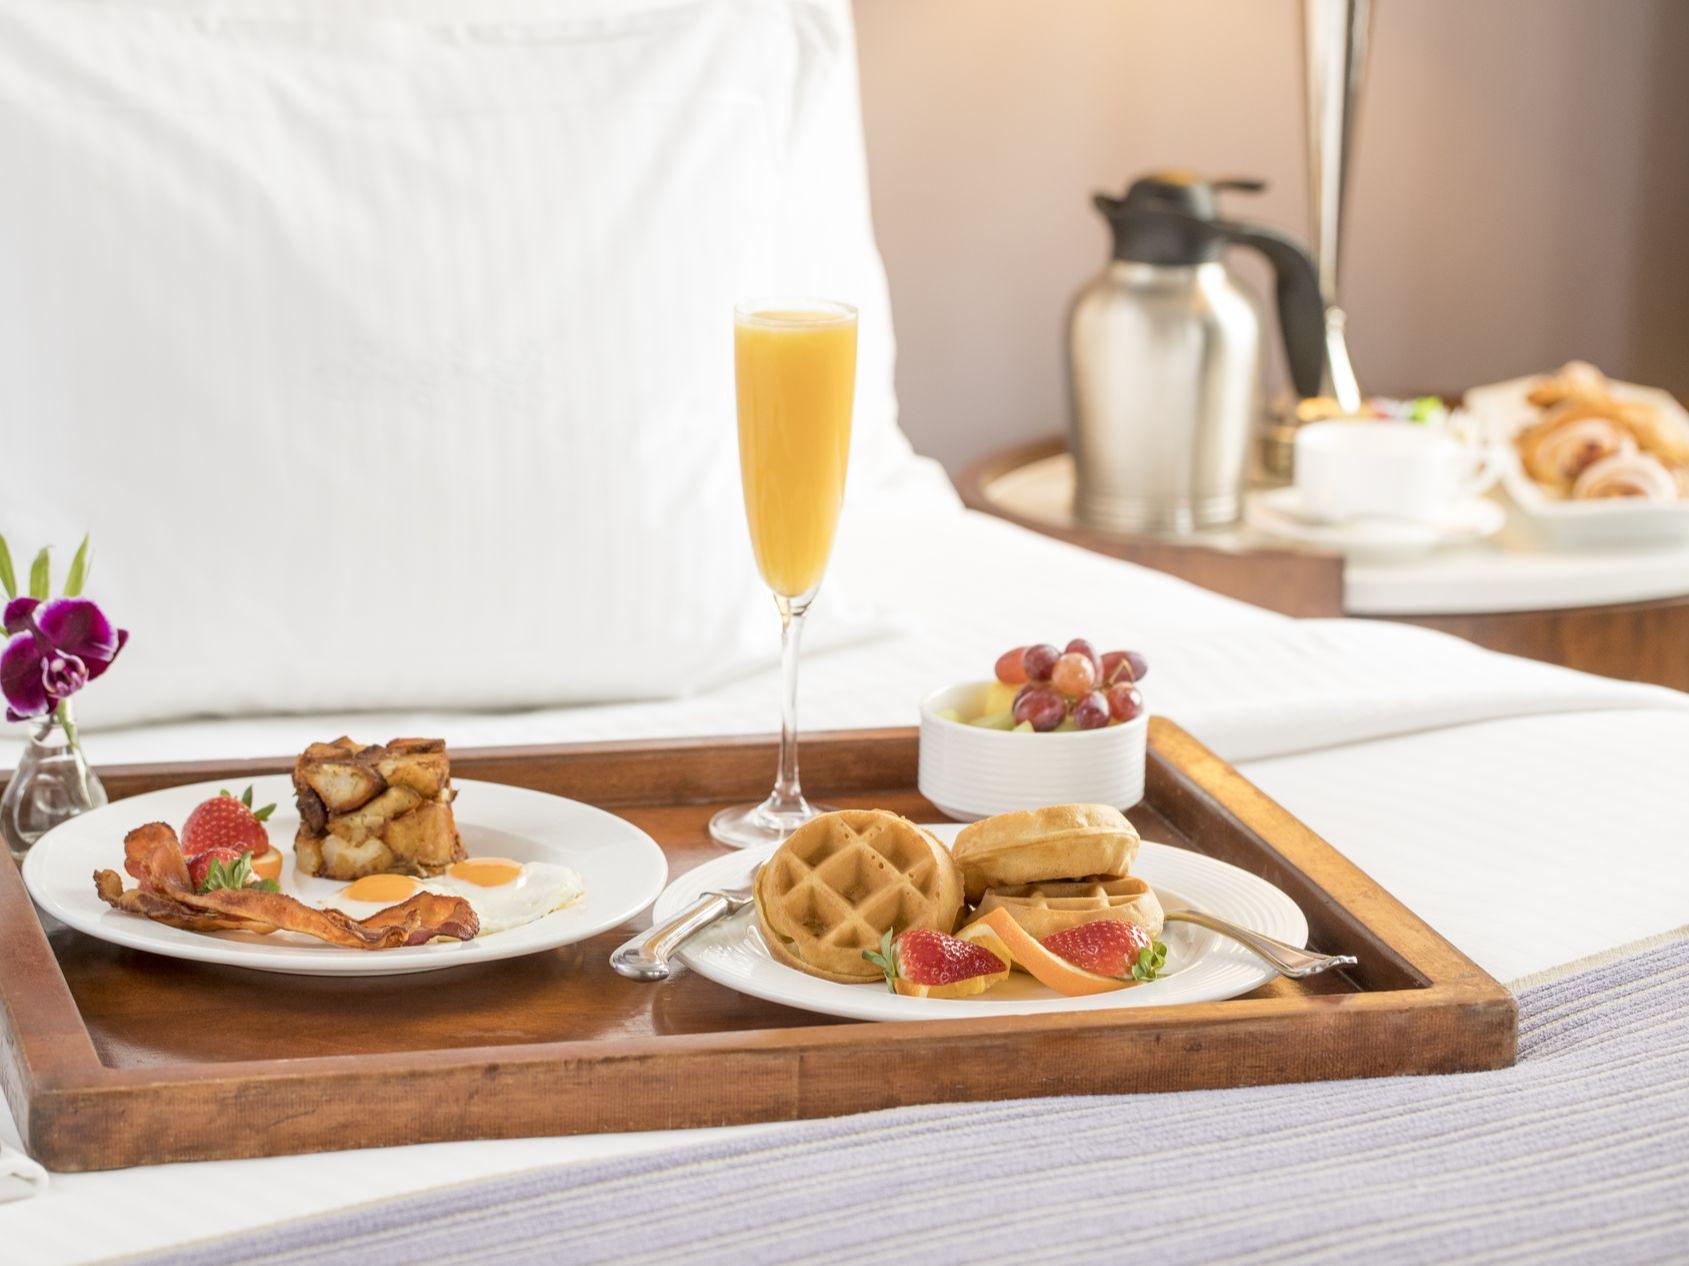 Room Service Waffles